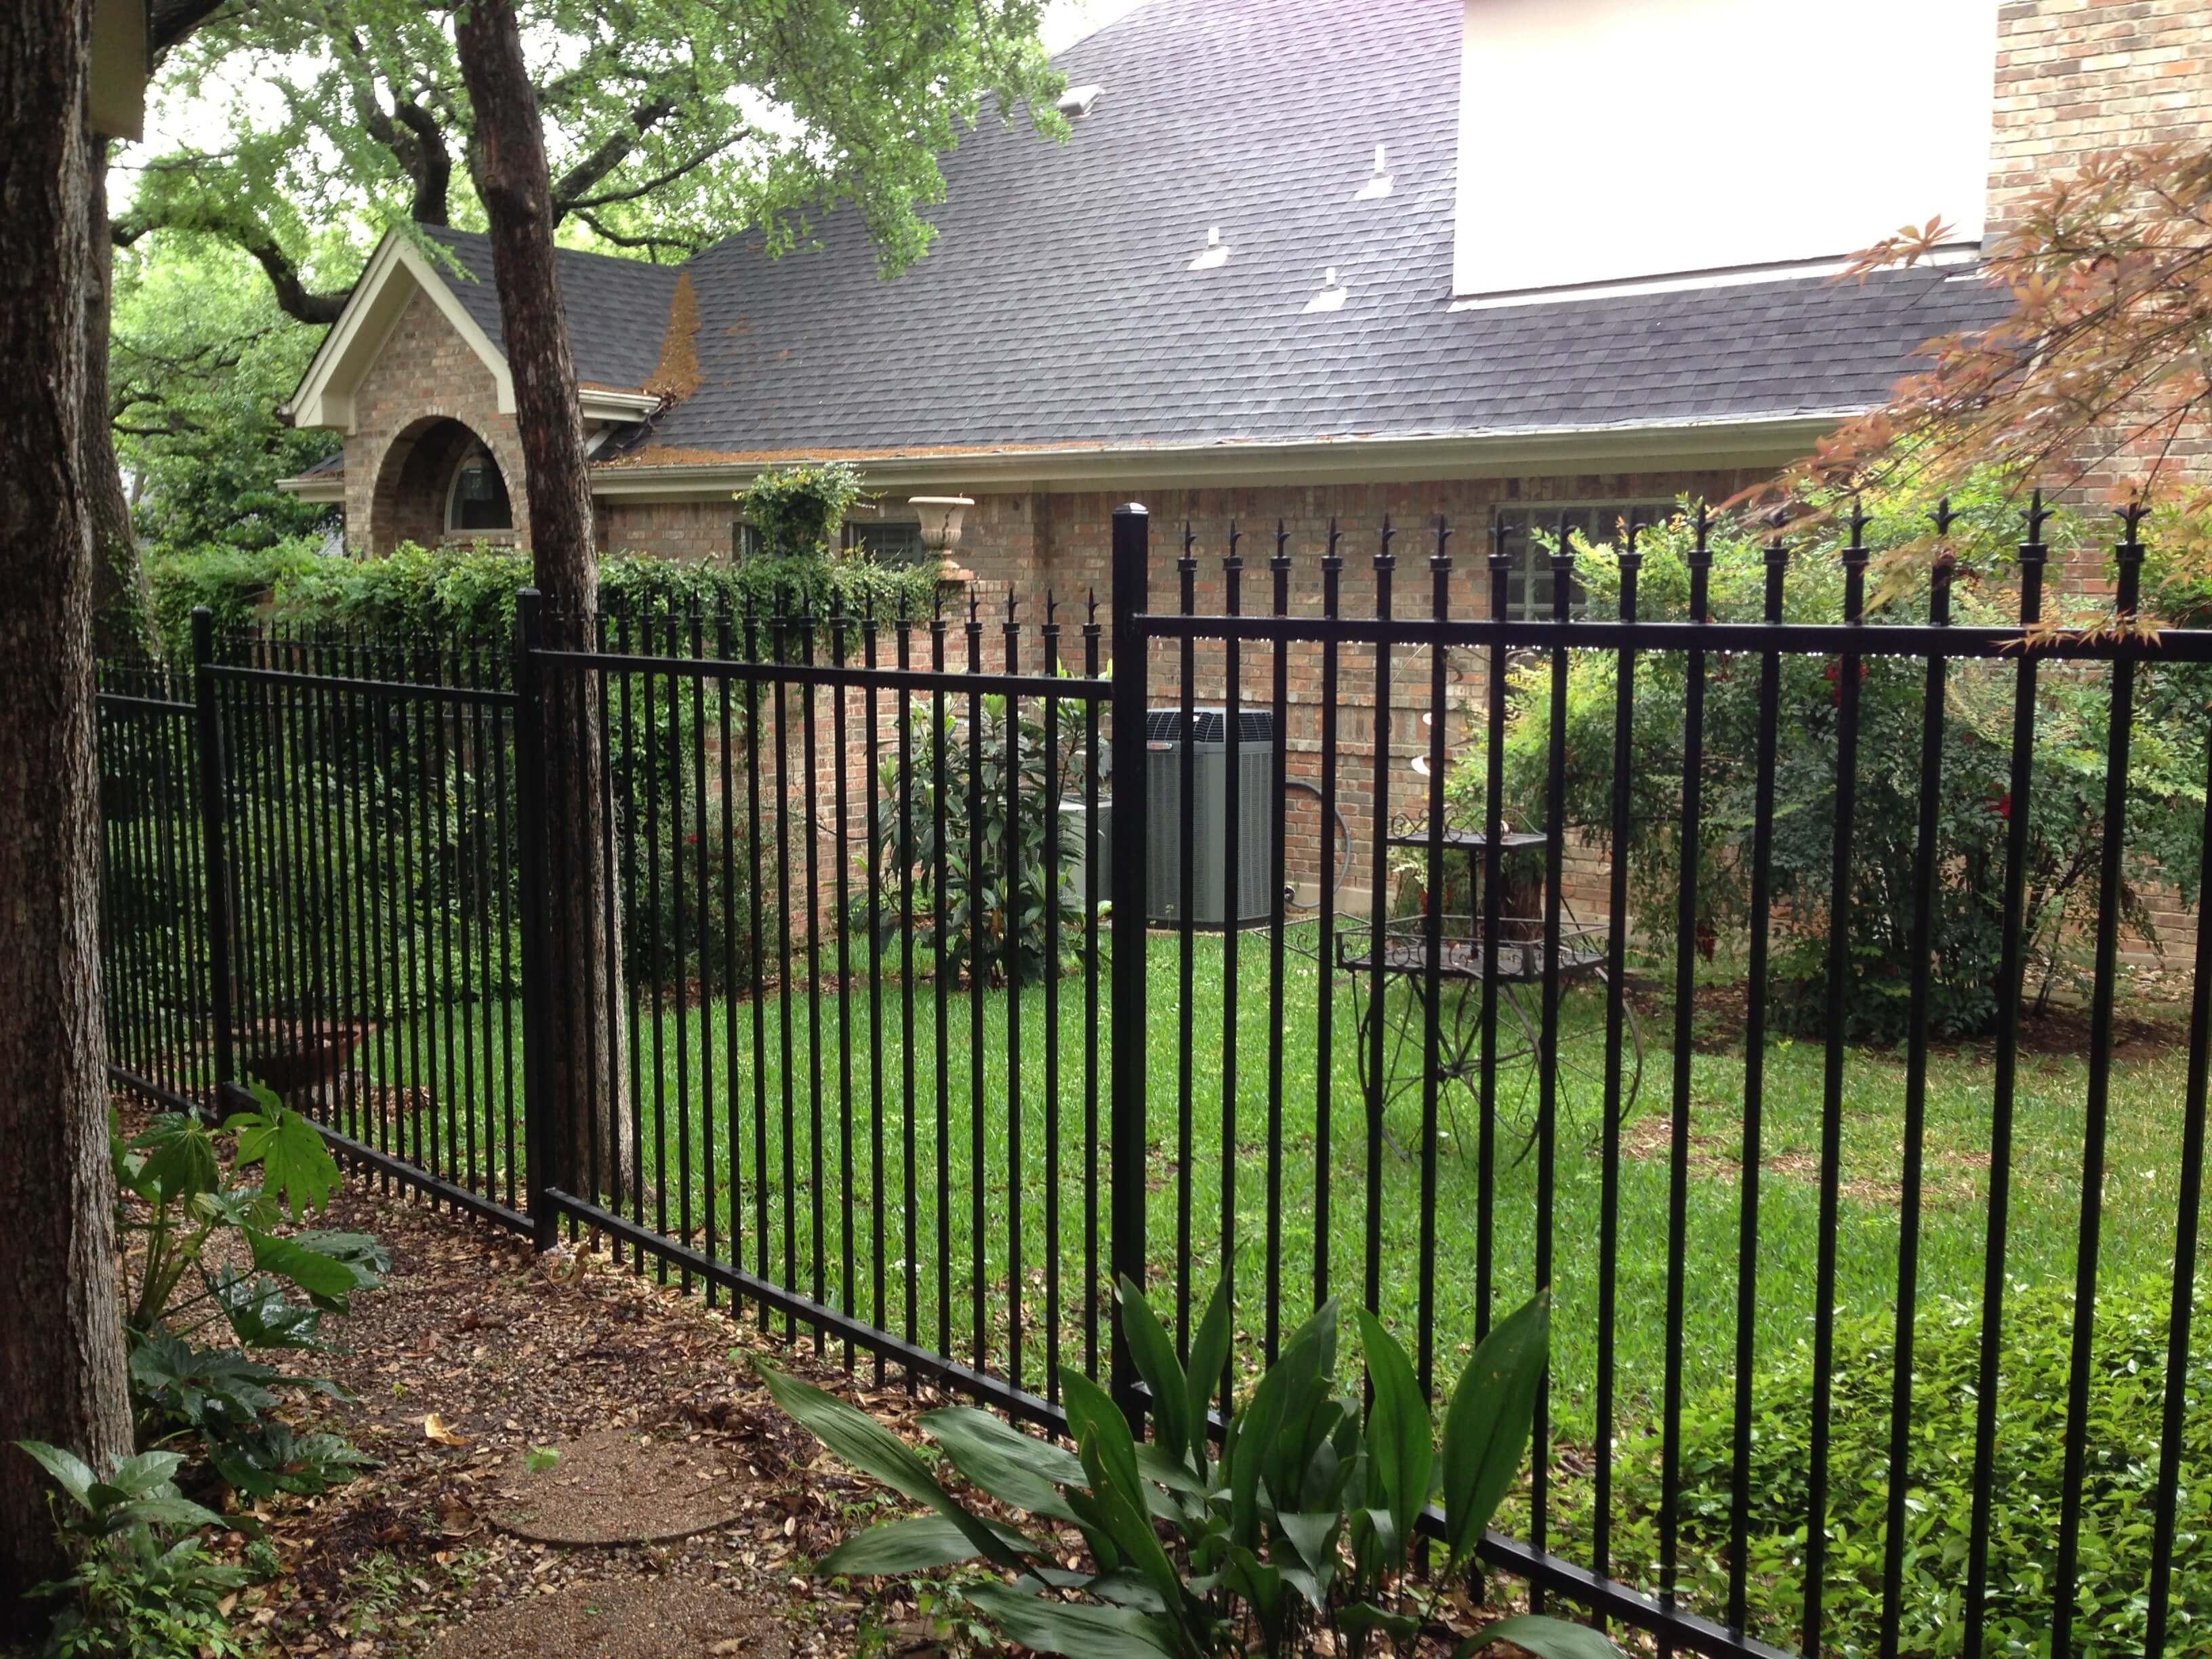 Pressed Spear Wrought Iron Fences - Apple Fence Austin, TX